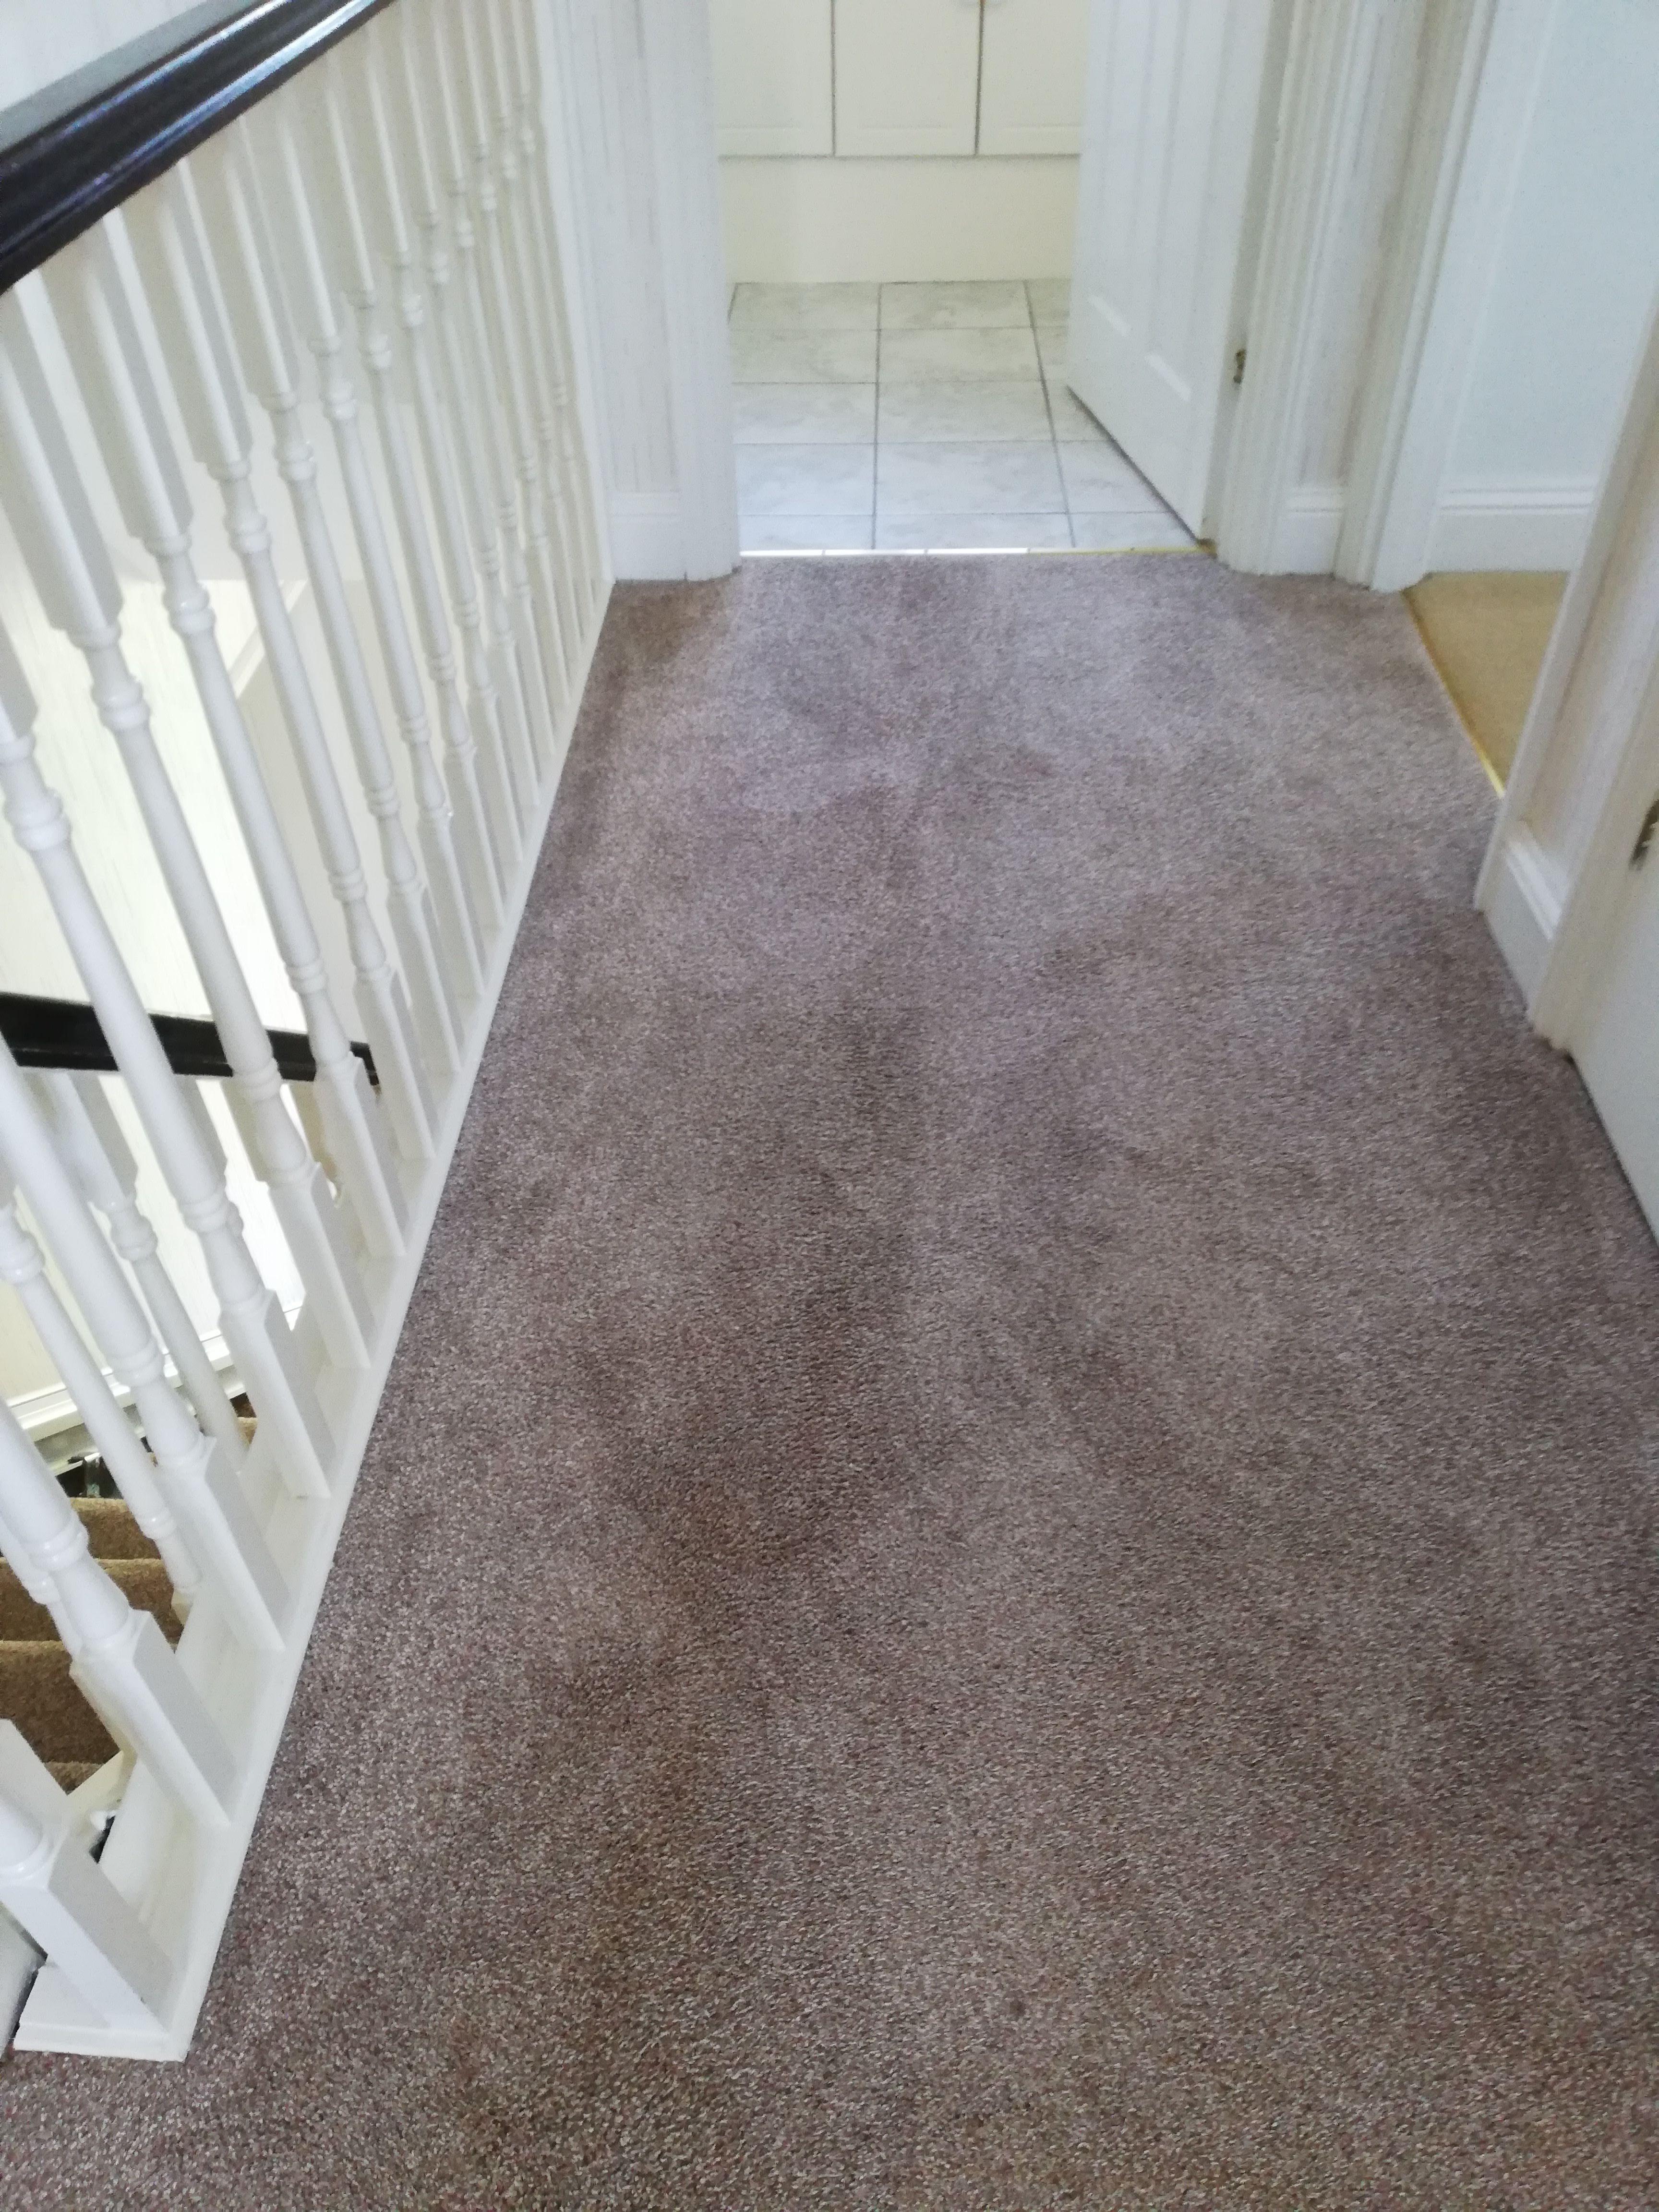 Carpet cleaning Rushden